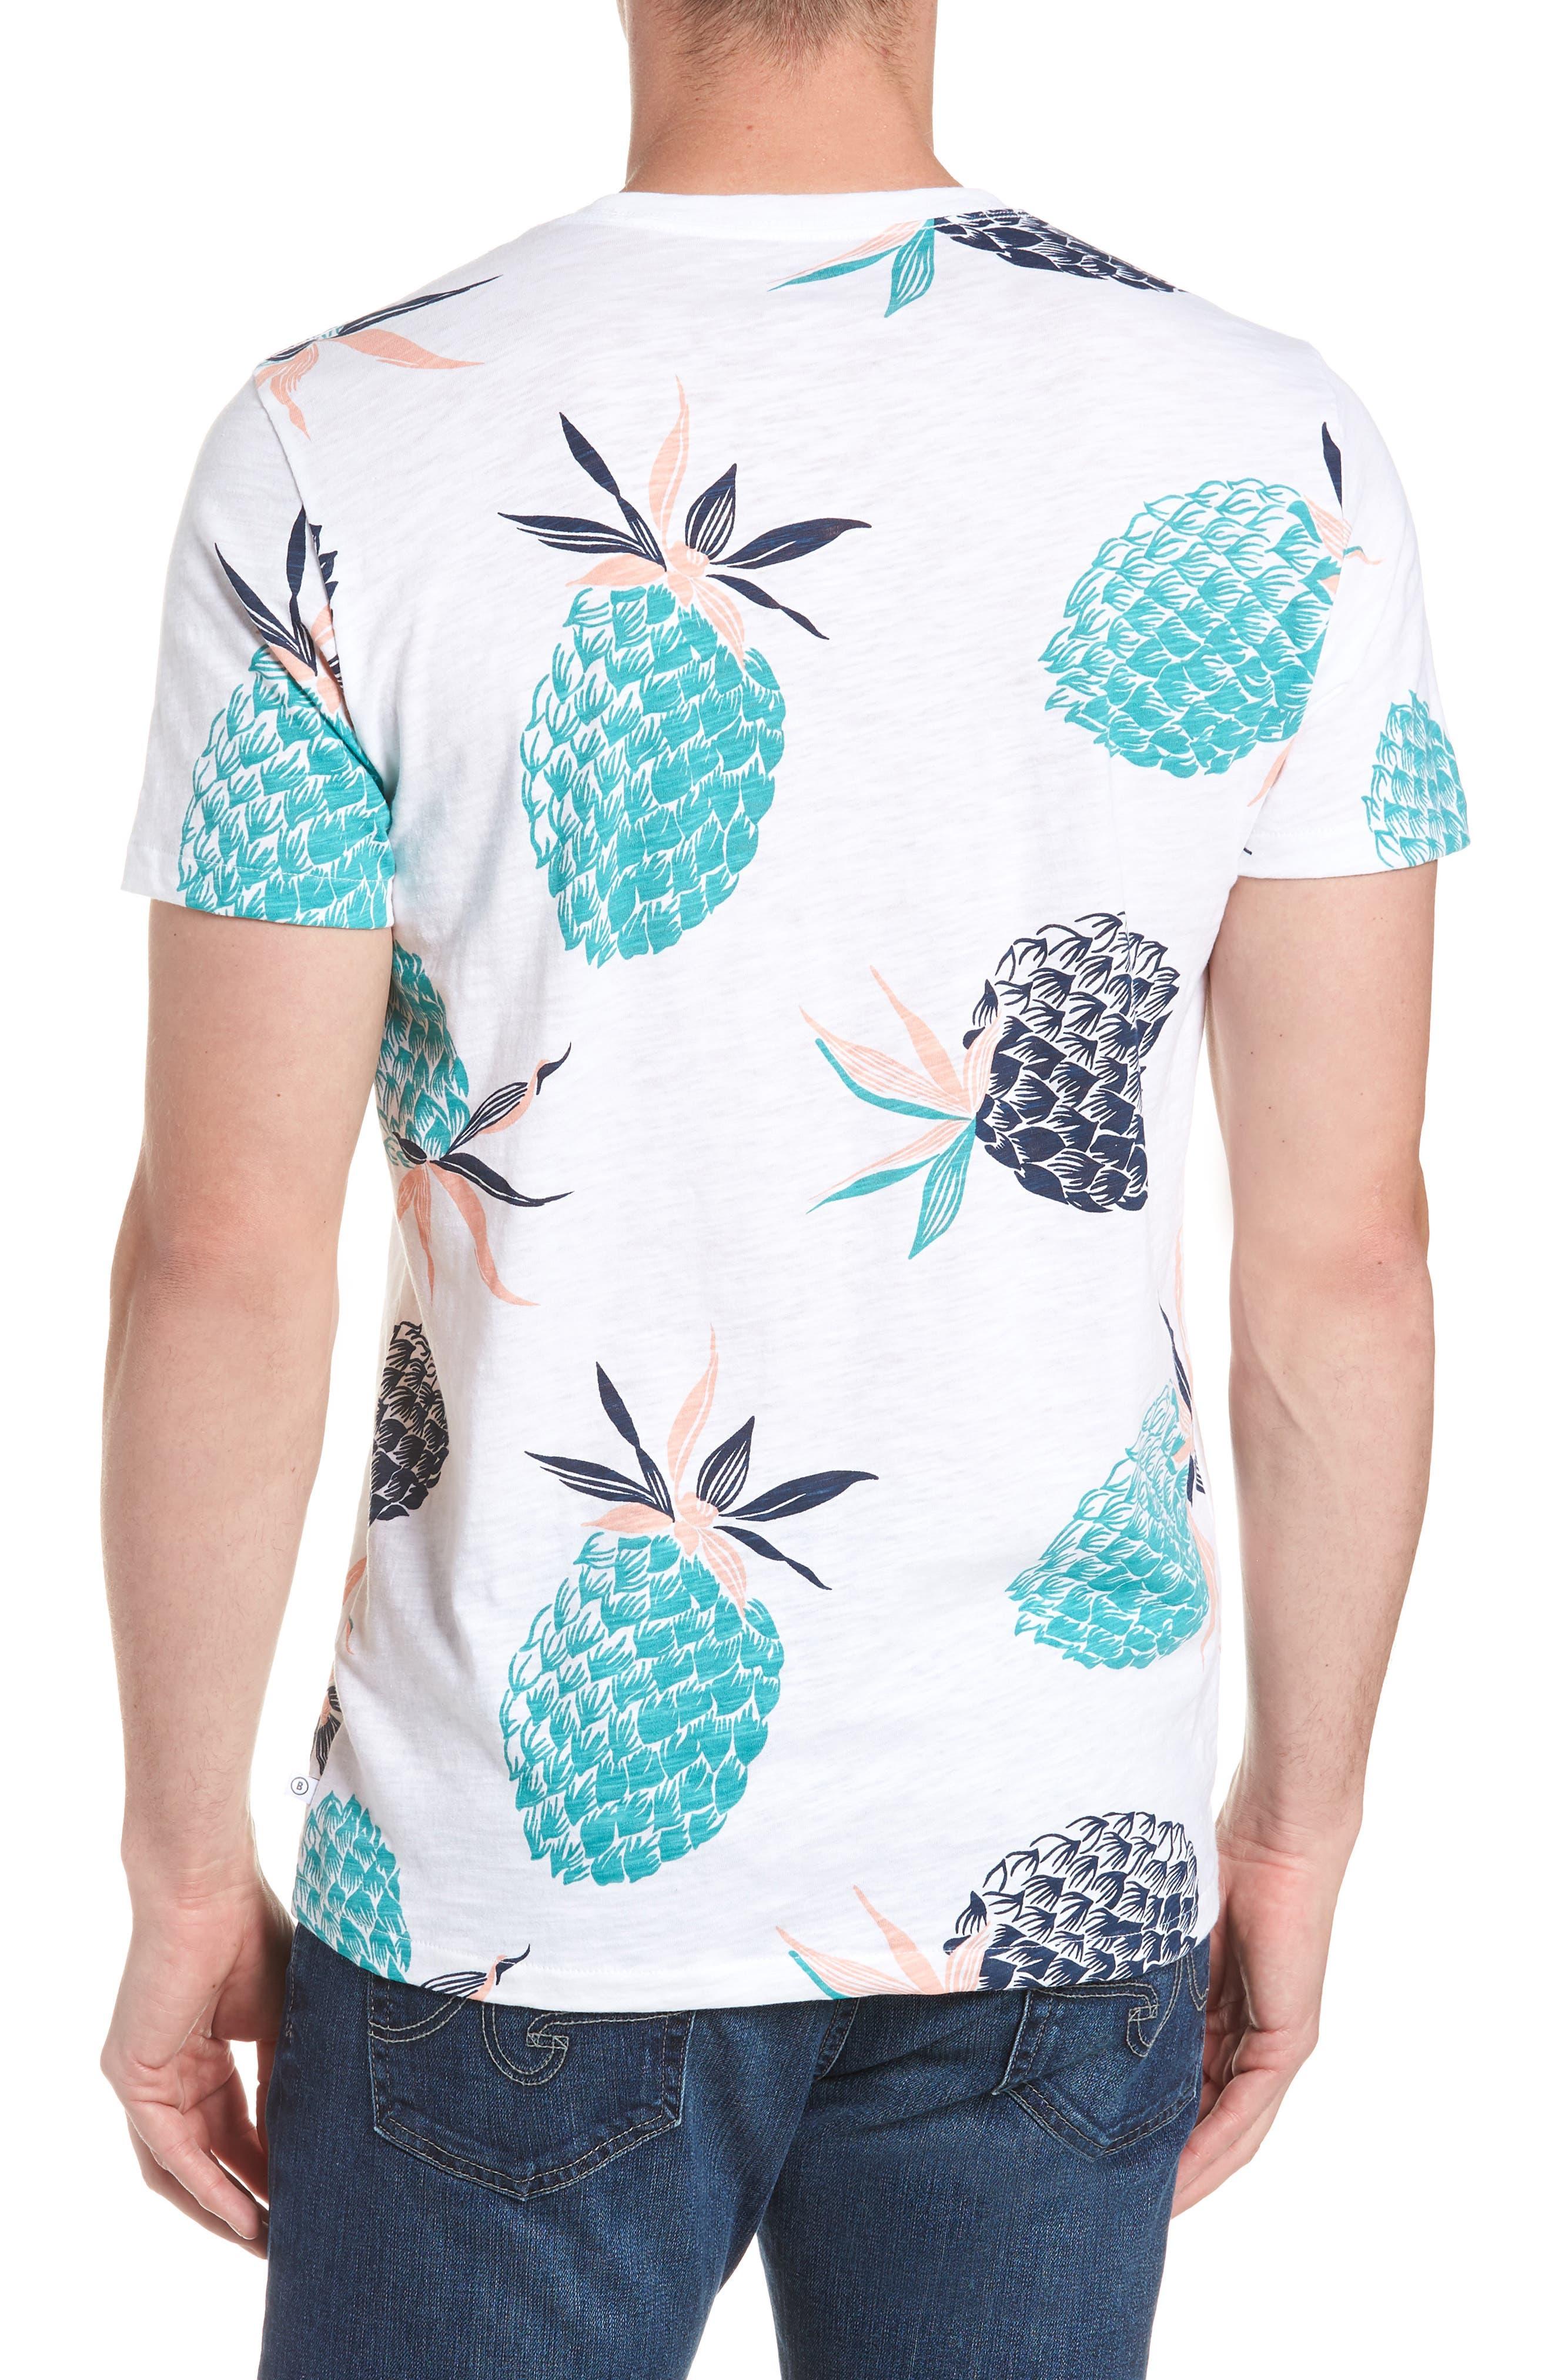 Pineapple Party Slim Fit T-Shirt,                             Alternate thumbnail 2, color,                             White/ Latigo Bay/ Sorbet